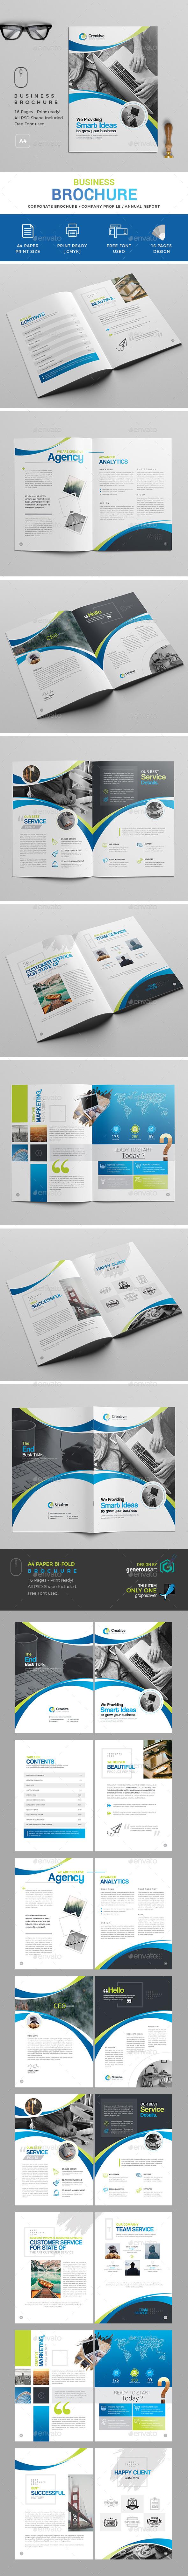 Brochure Template - Brochures Print Templates